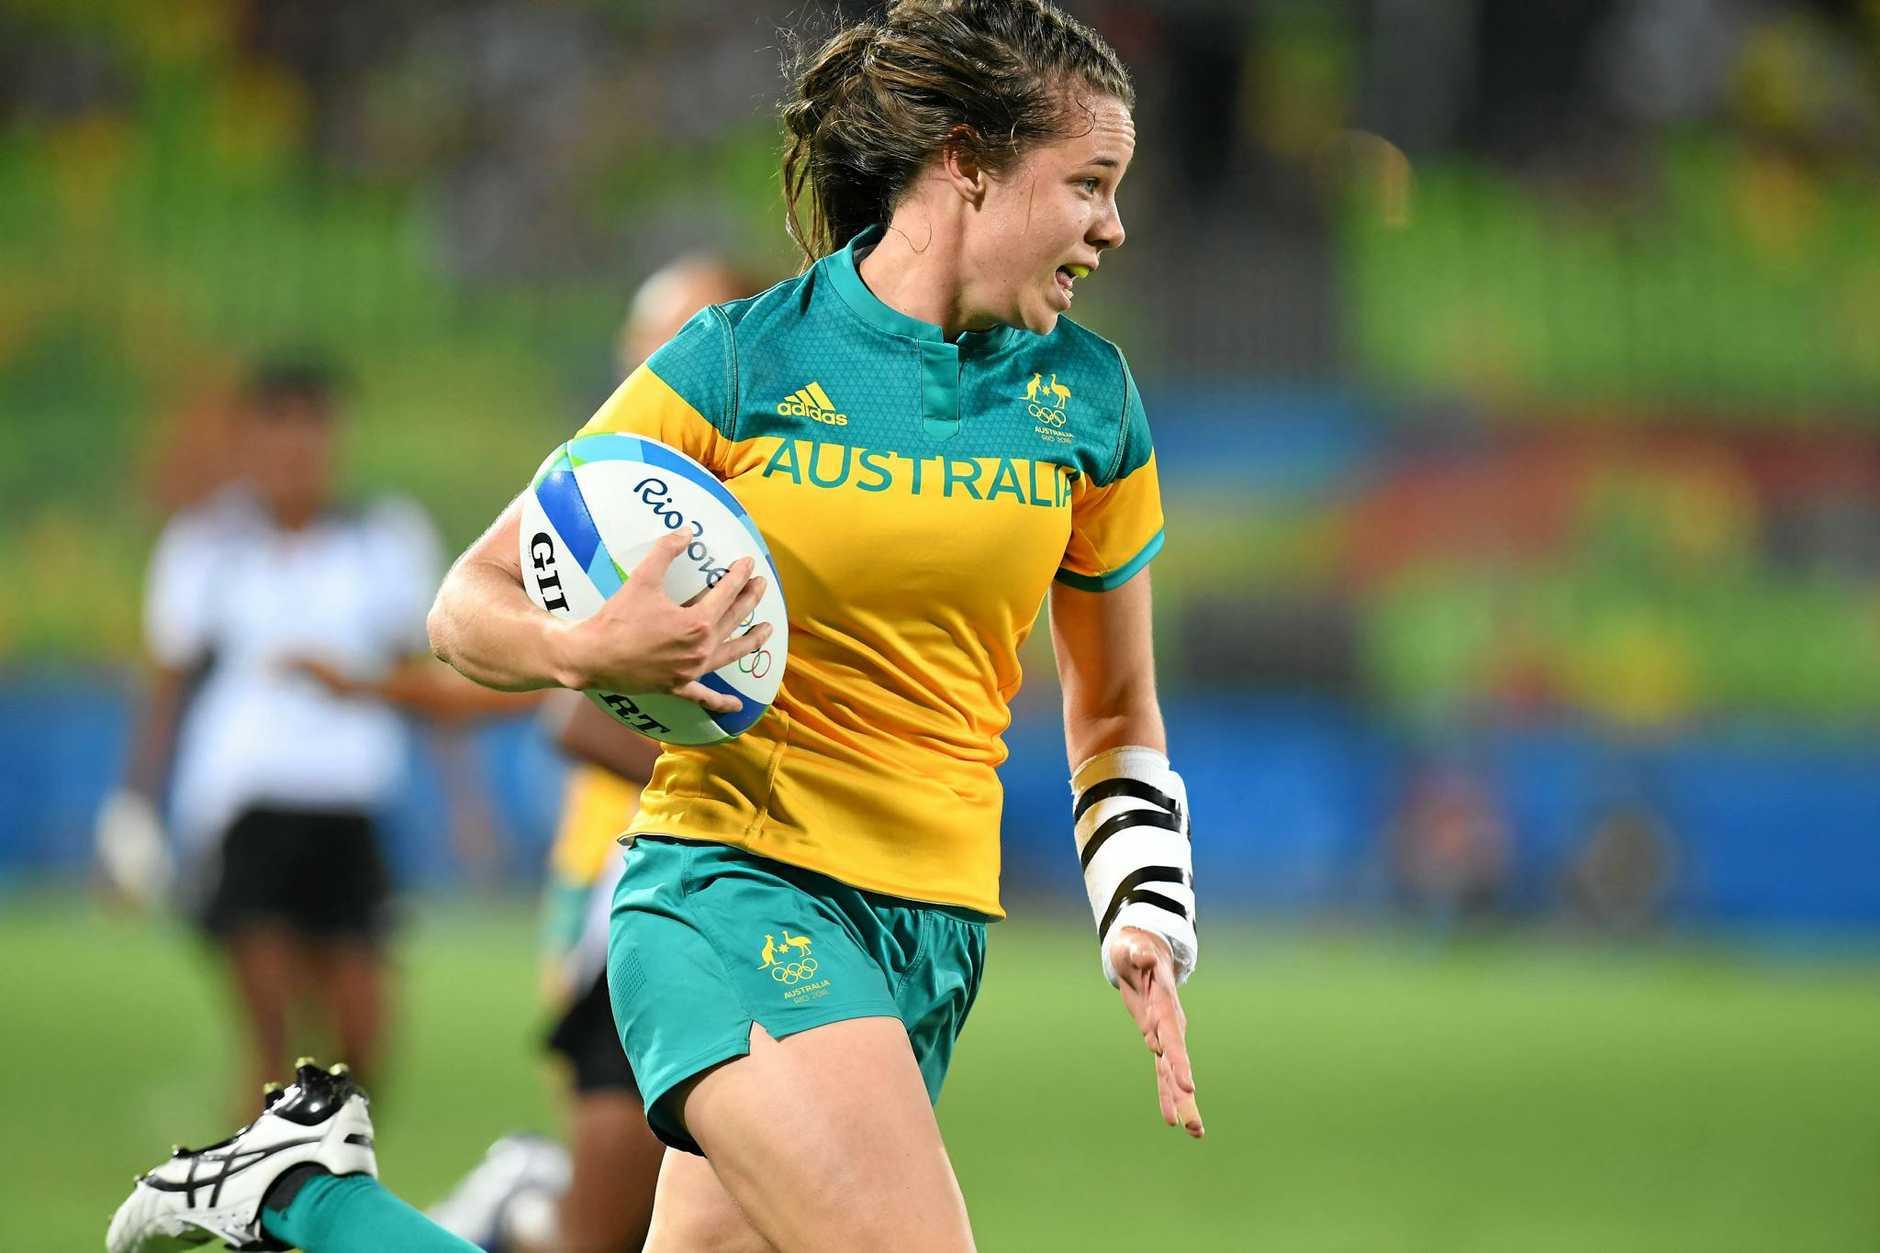 Australia's Chloe Dalton runs into score at the Rio Olympics.